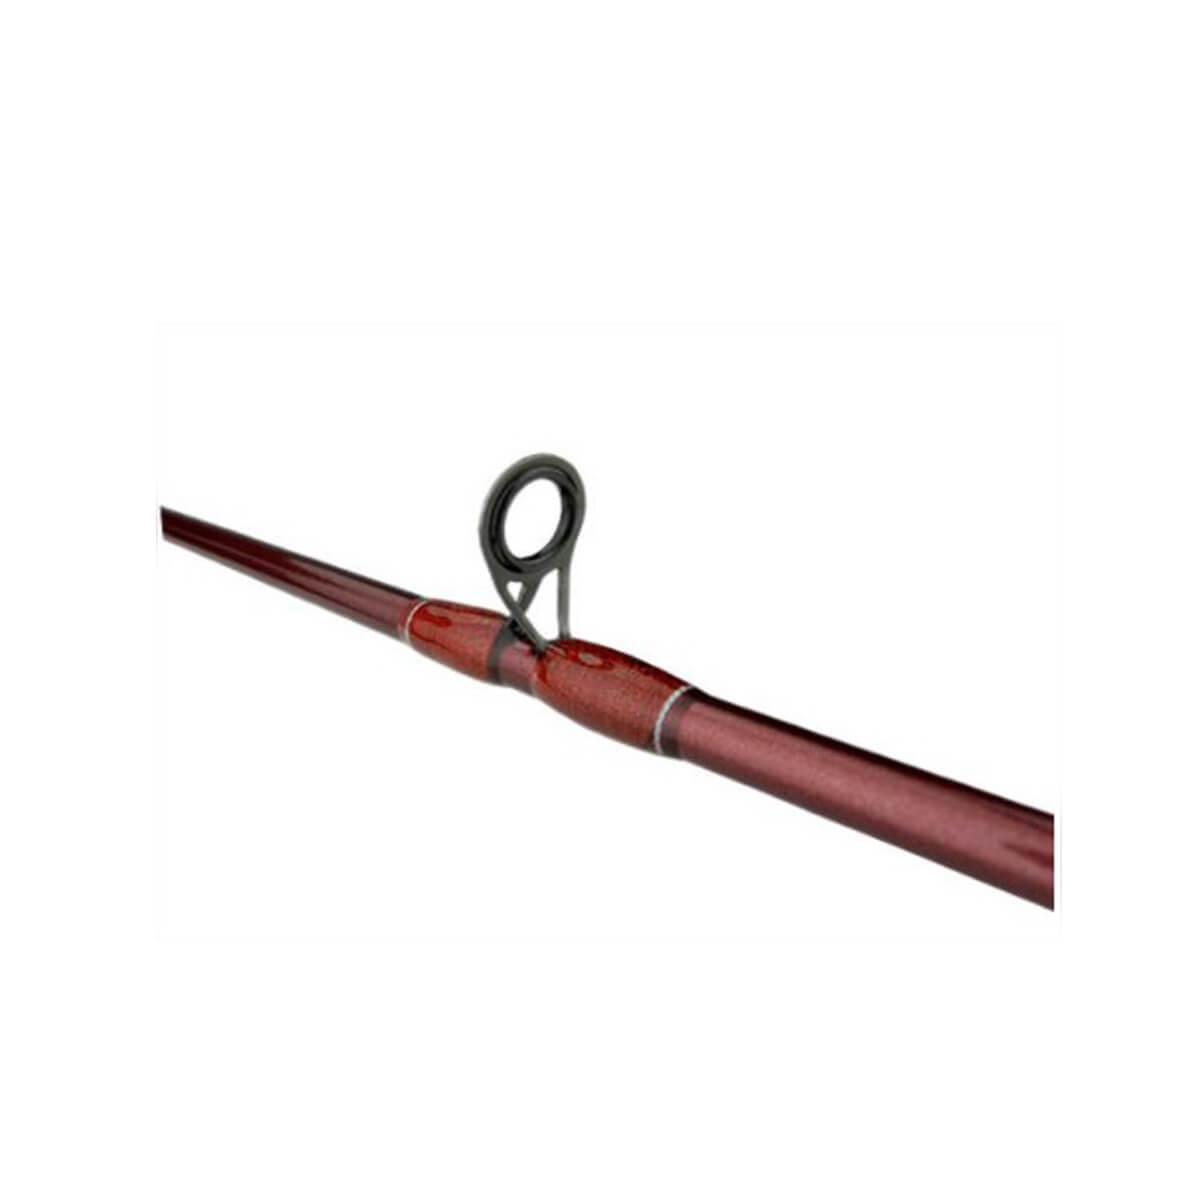 Vara Rapala Bronze Zx p/ Carretilha 5